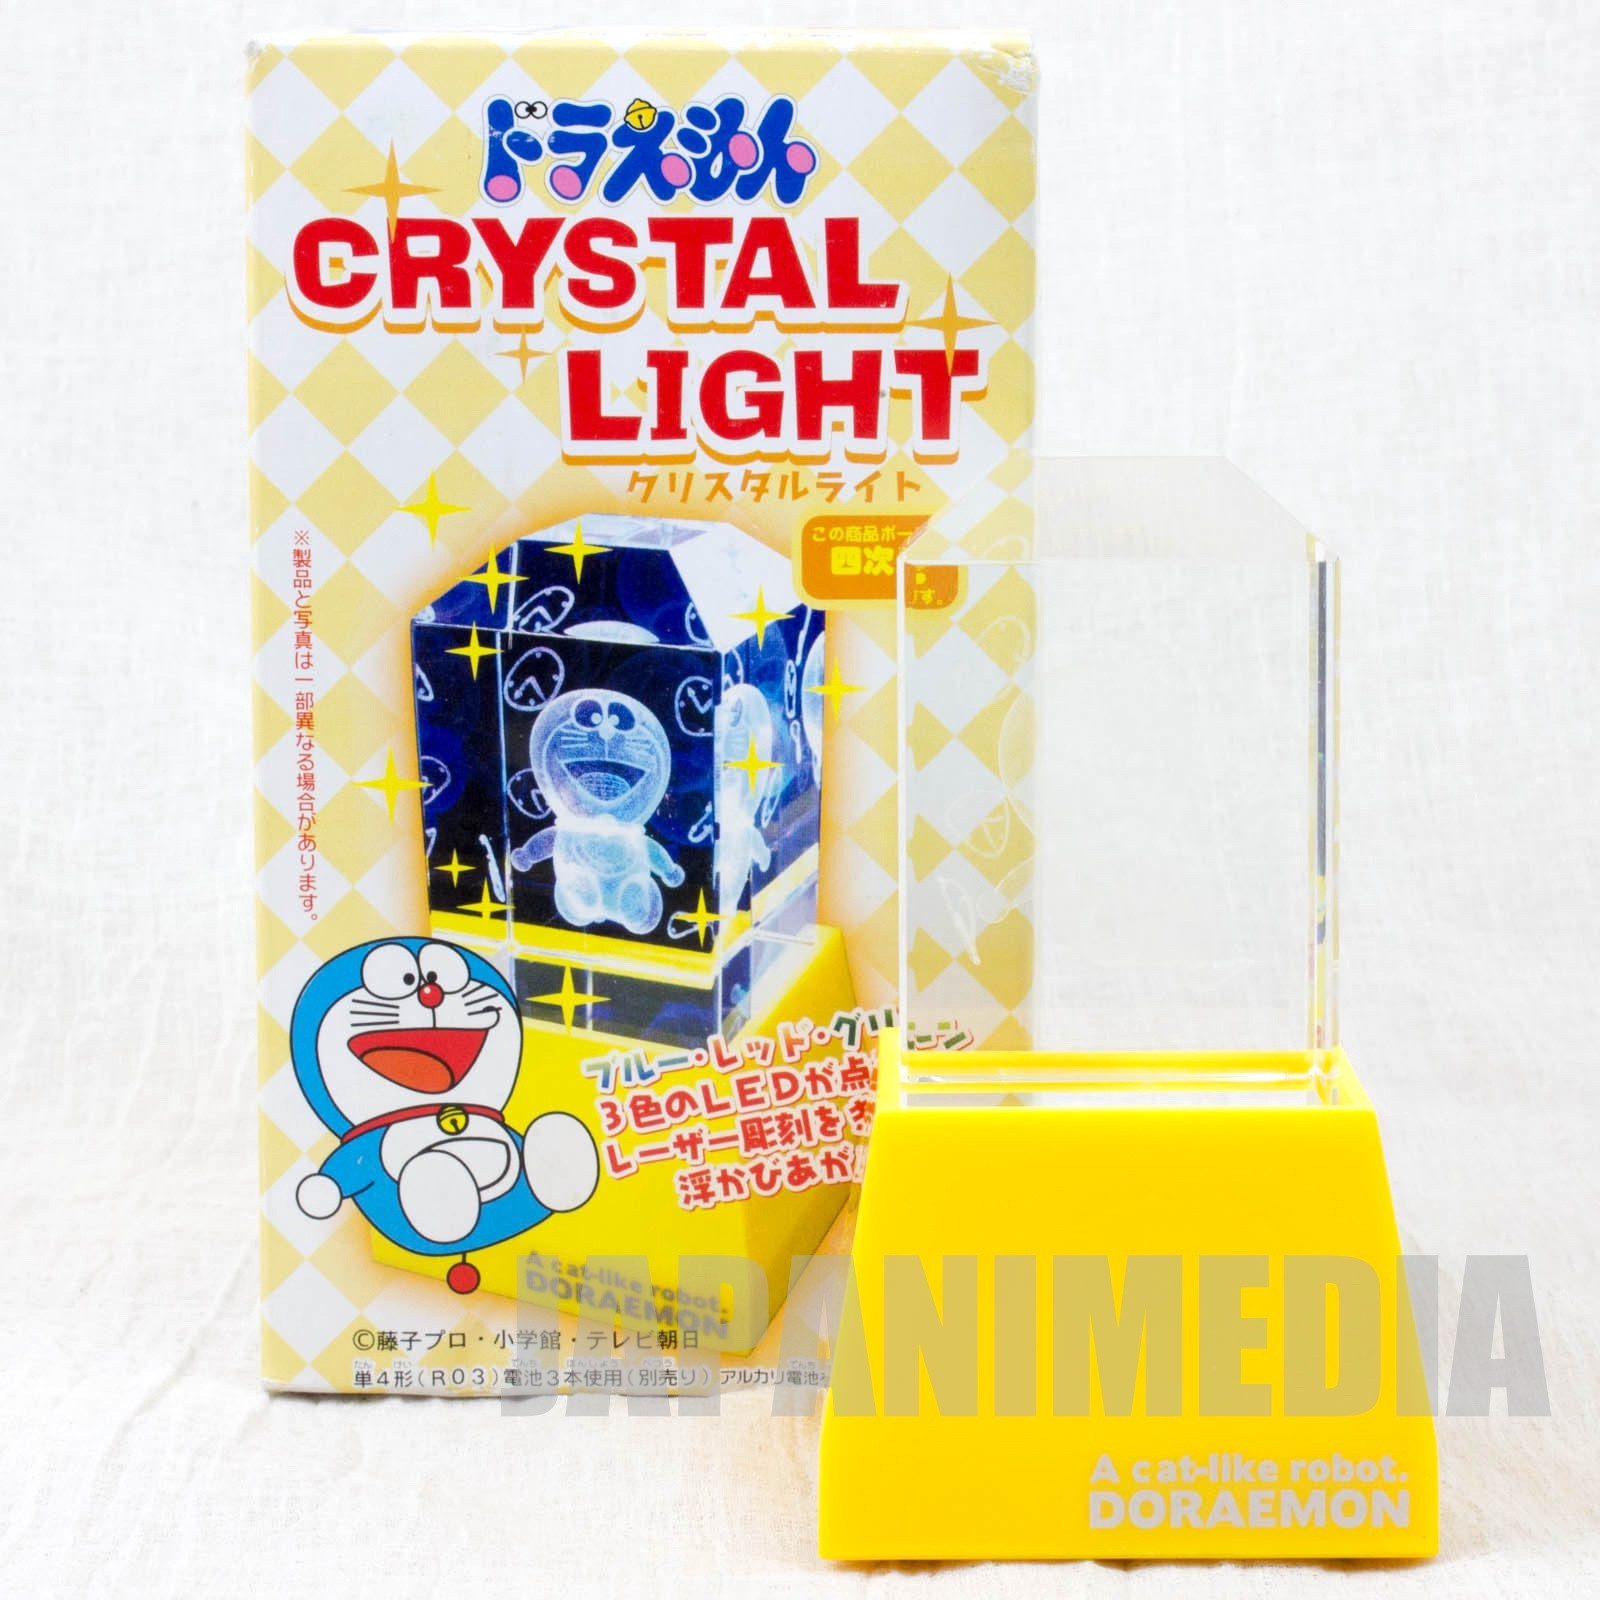 RARE!! Doraemon Crystal Decoration LED Light Fourth dimension ver. ANIME JAPAN